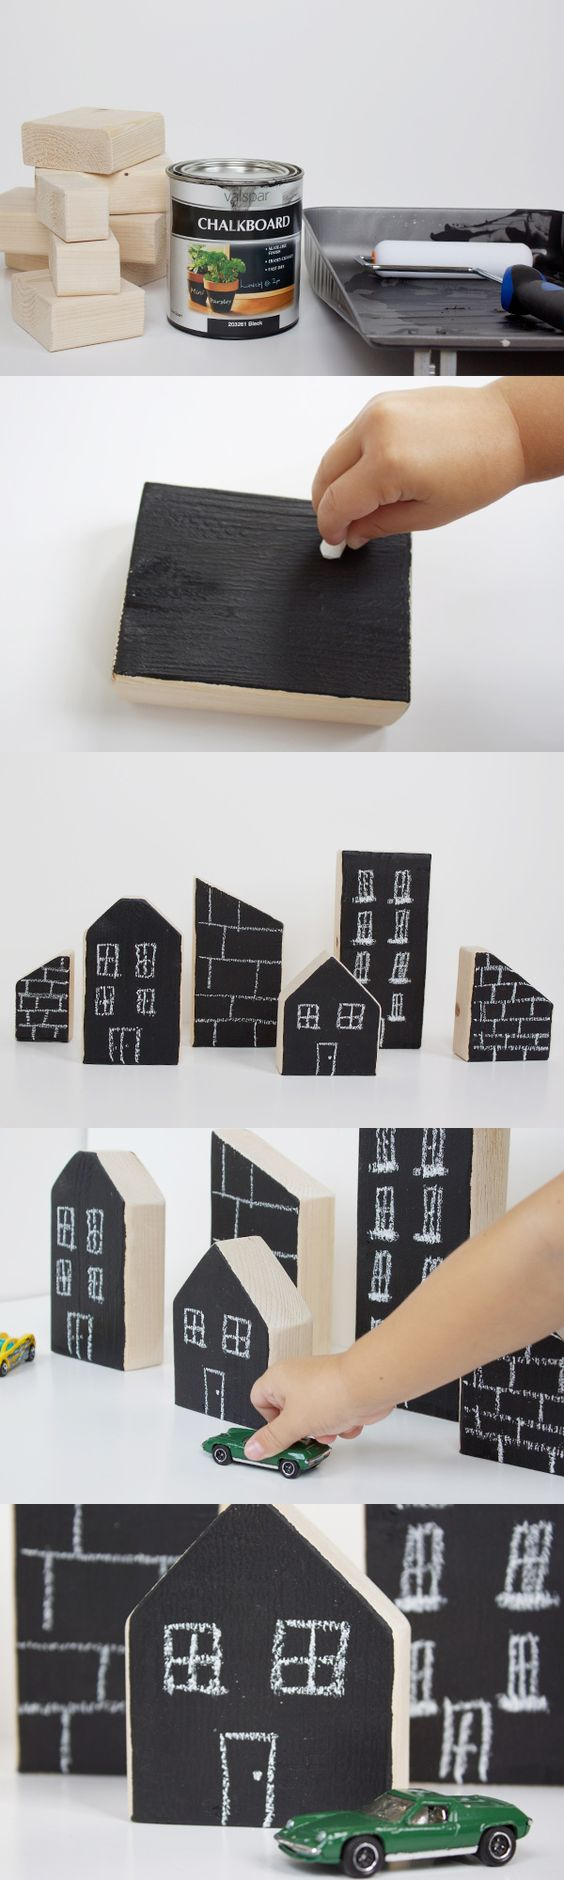 juguetes-madera-bloques-pizarra-muy-ingenioso-2: